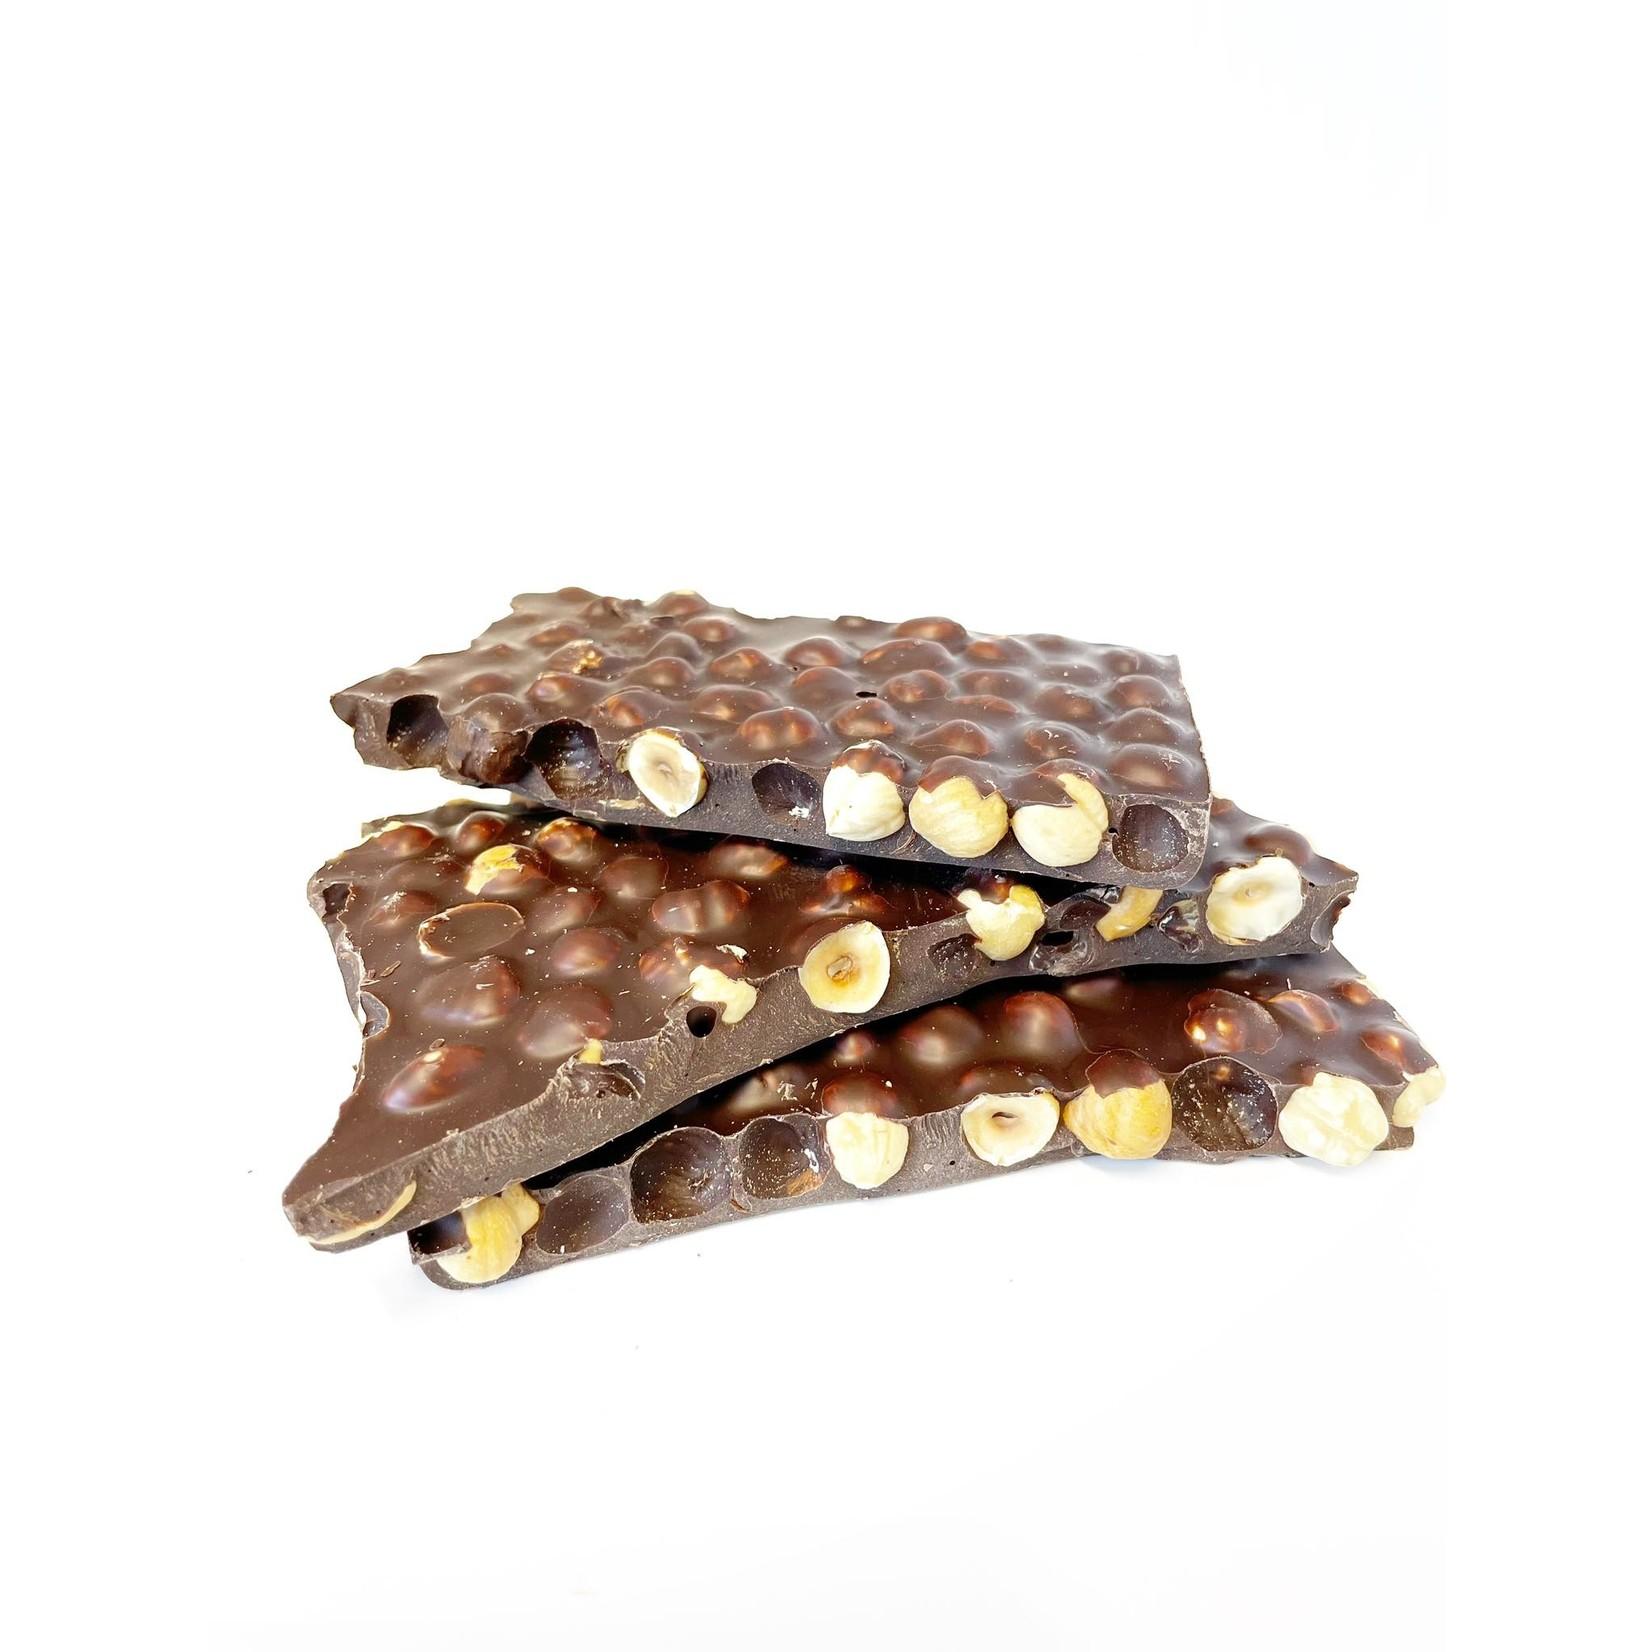 Blokchocolade Hazelnoot Puur 400g